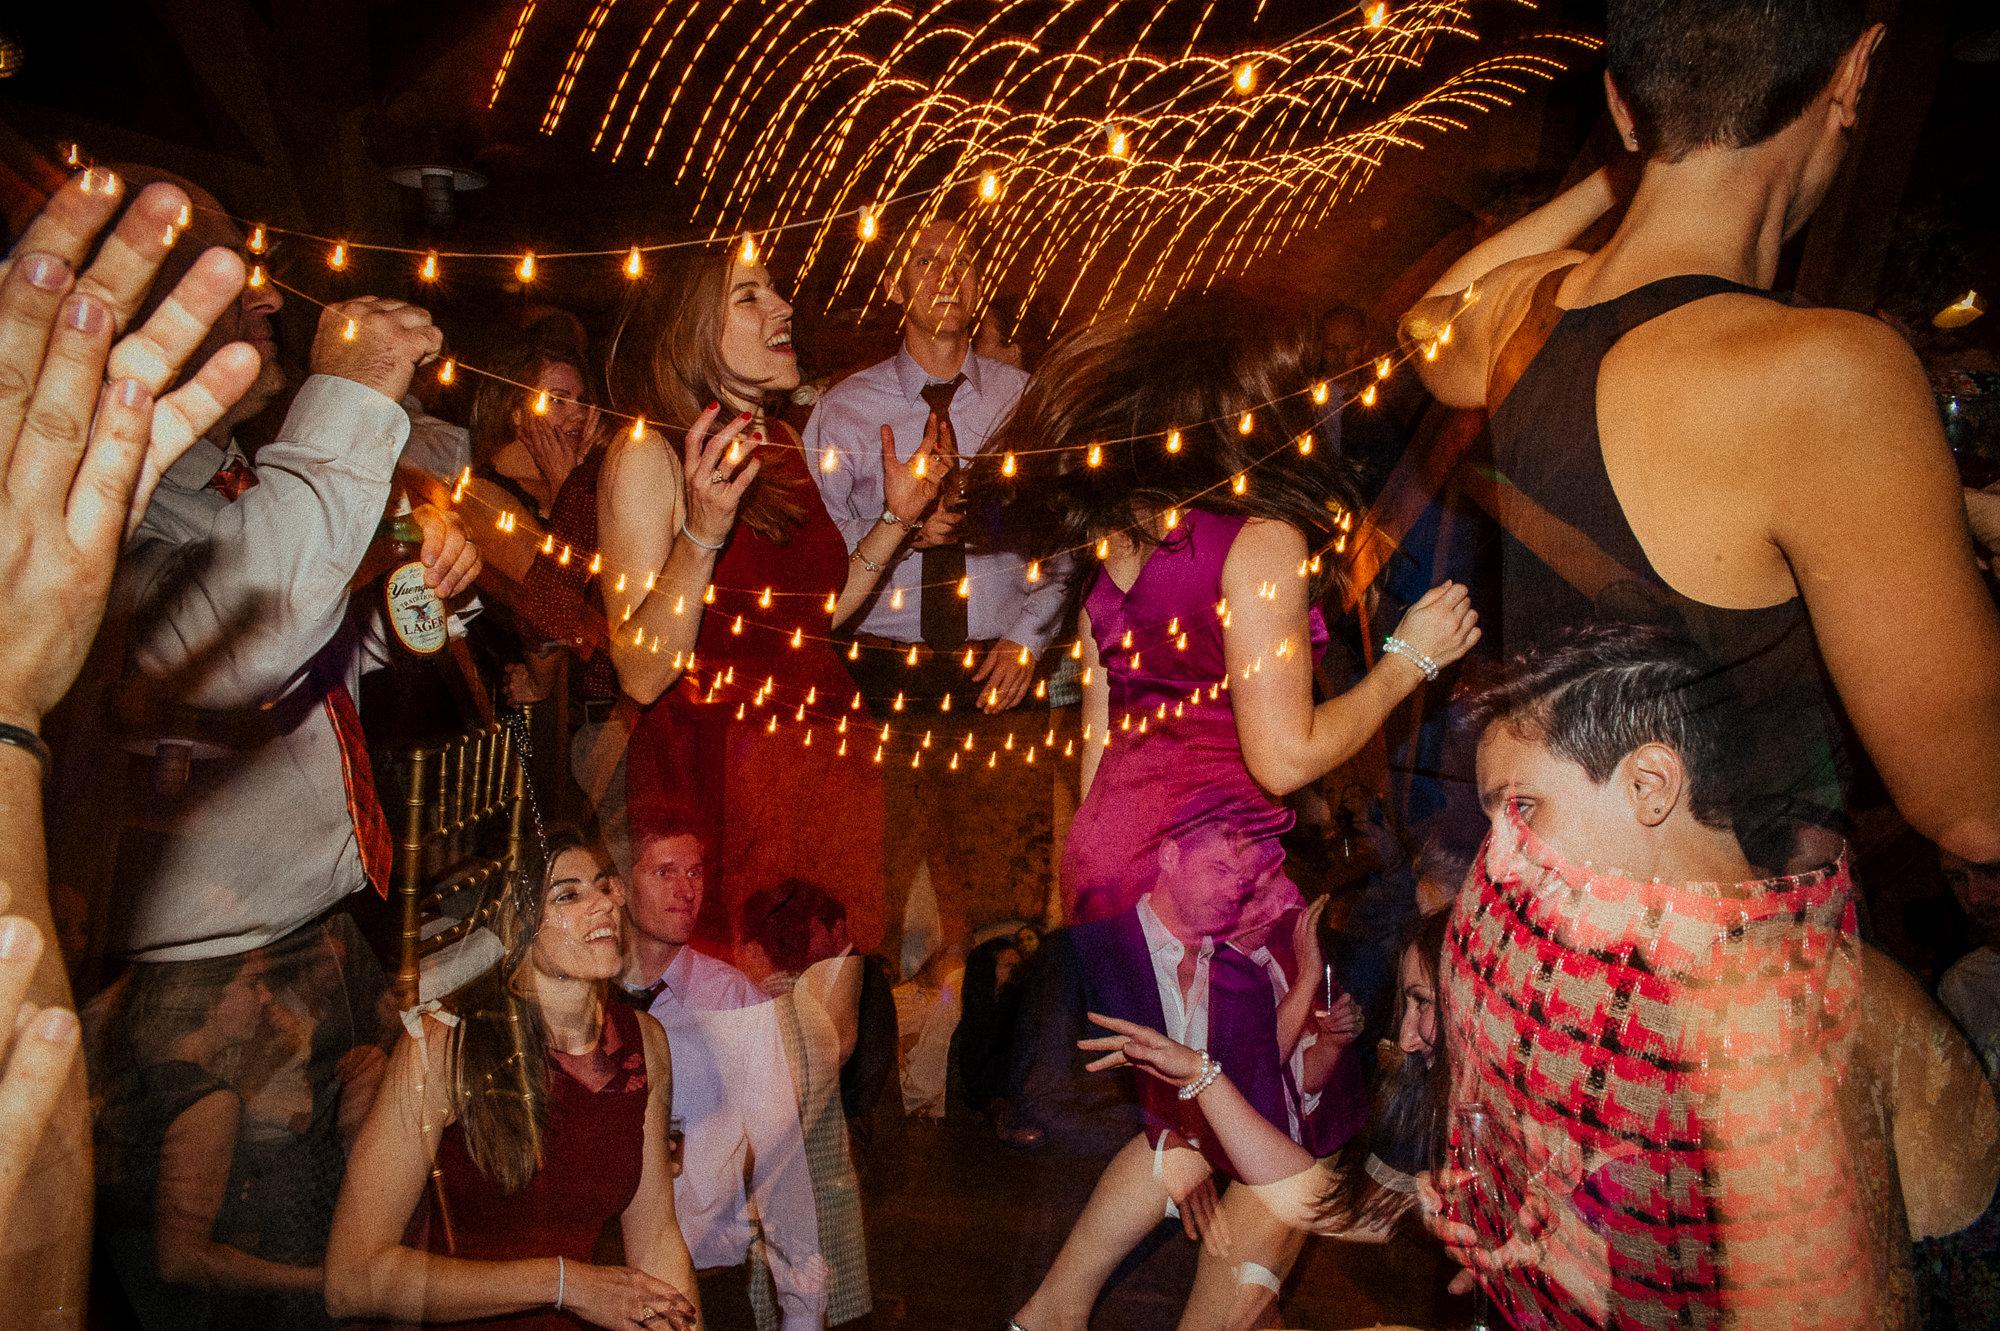 wedding_dancing_fun46.JPG